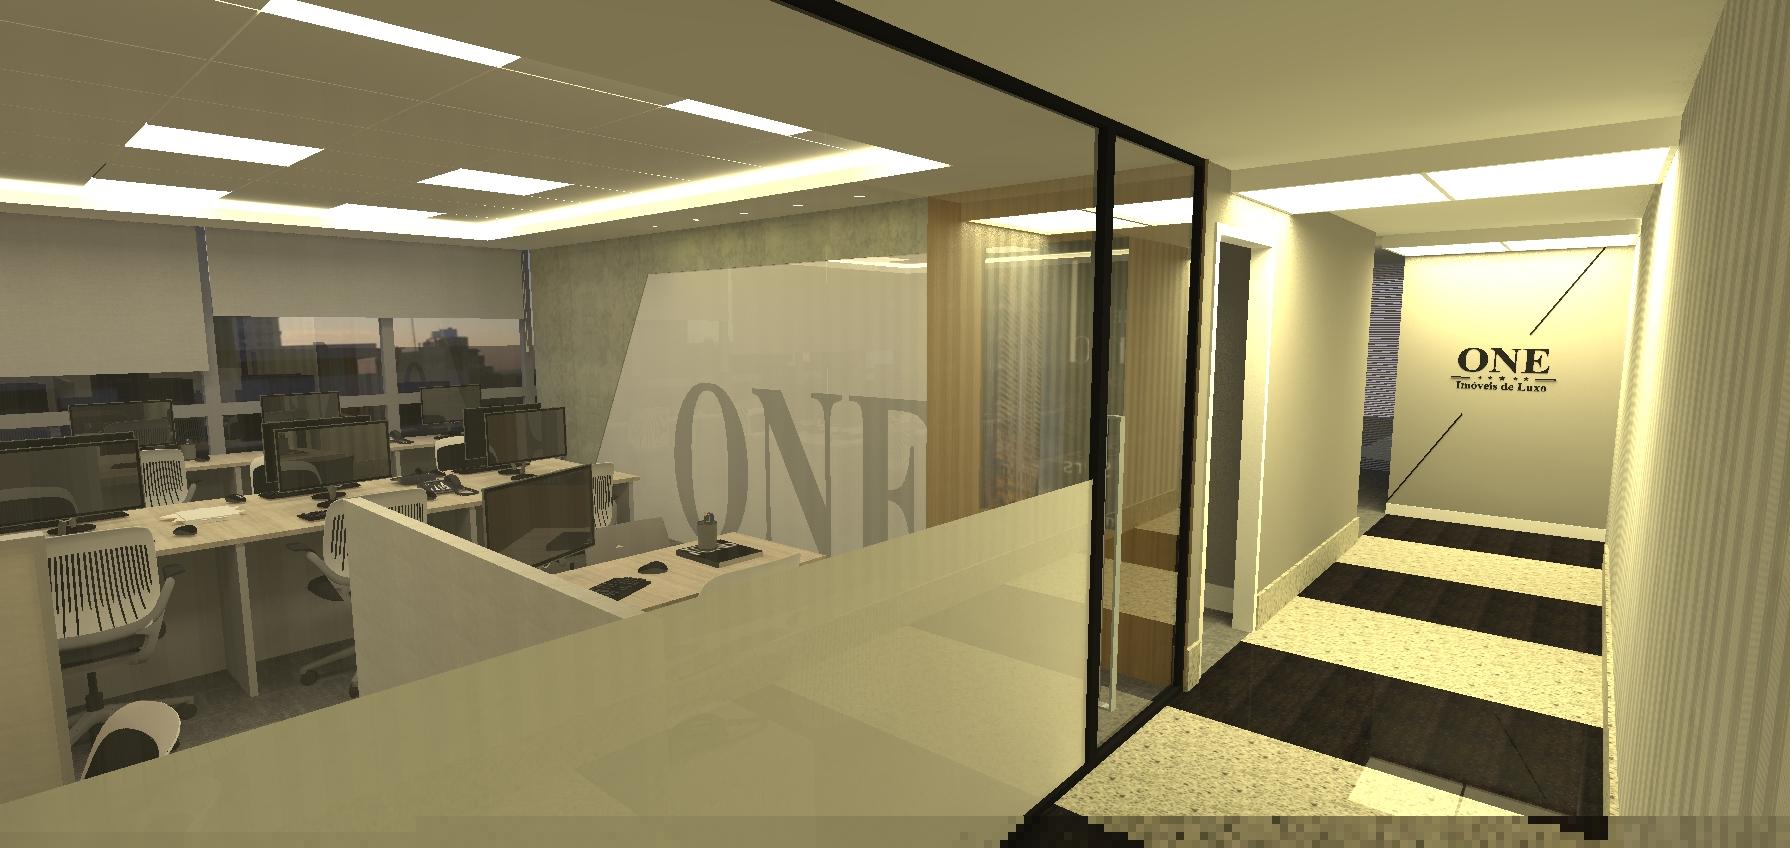 One Imobiliaria - Render 01